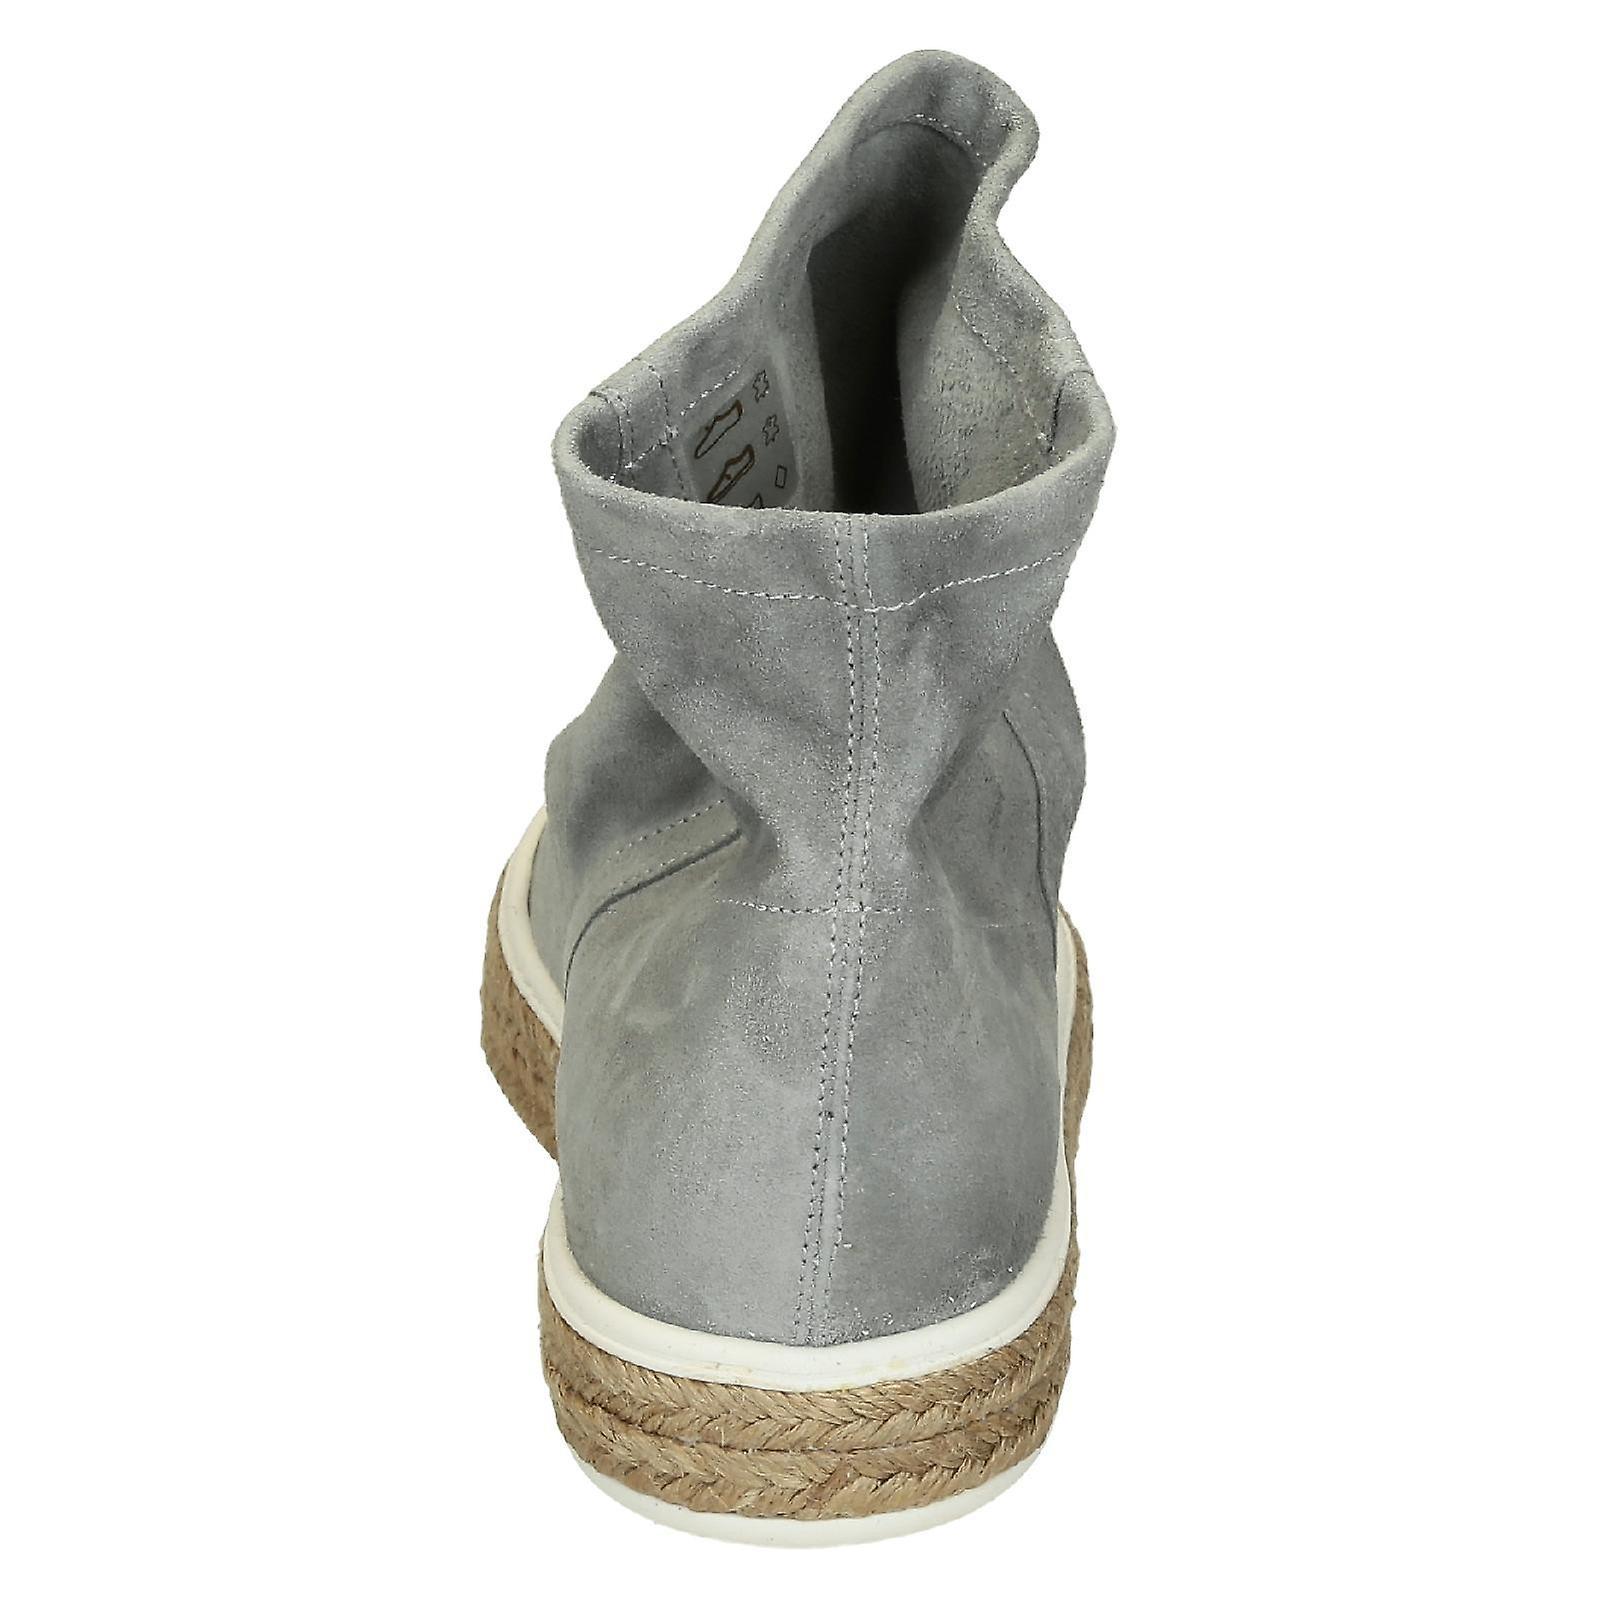 Leonardo Shoes 3091scamosciatoperla Women's Grey Suede Ankle Boots